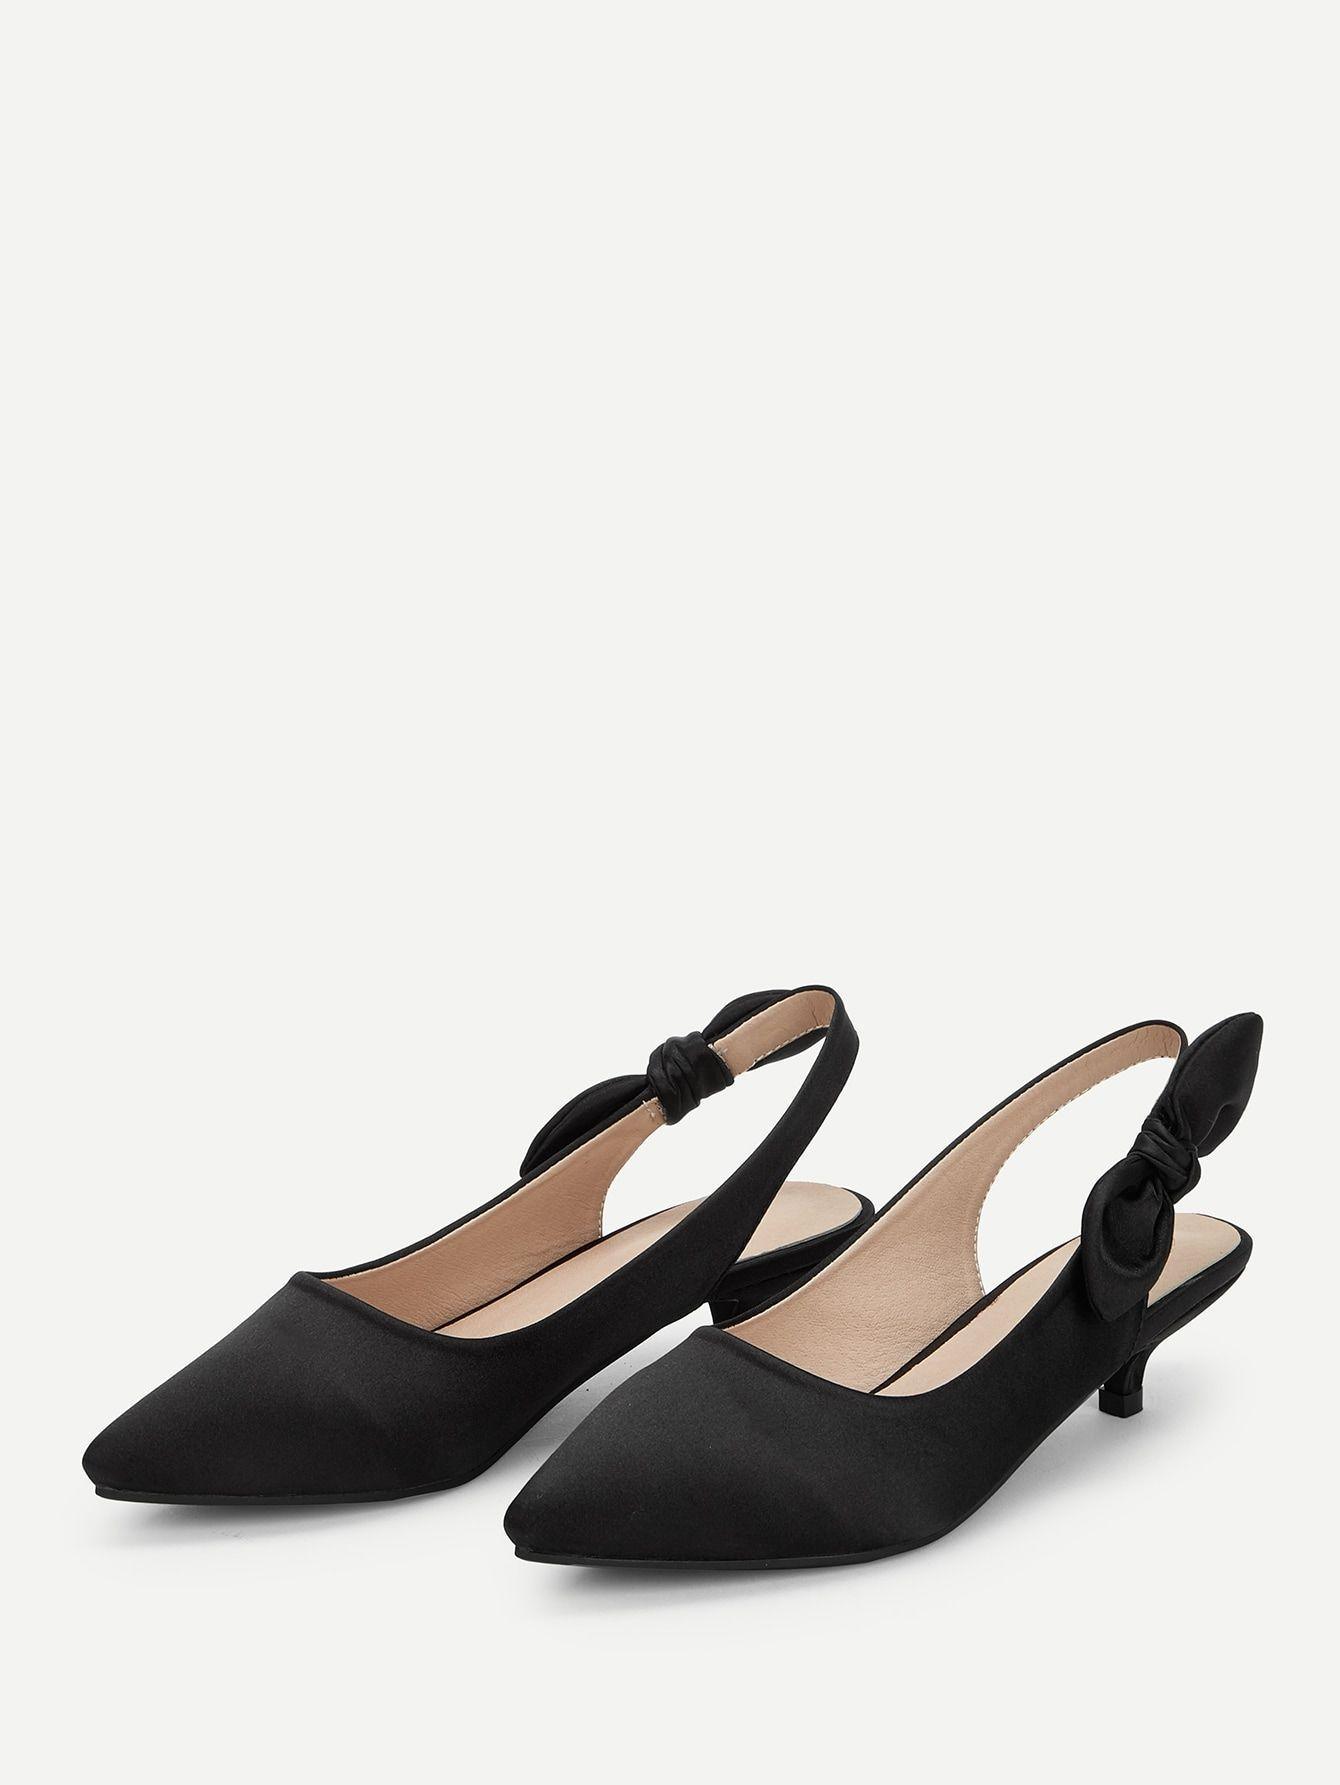 a64e9d644fe Casual Point Toe Plain Slingbacks Black Low Heel Bow Tie Decor ...